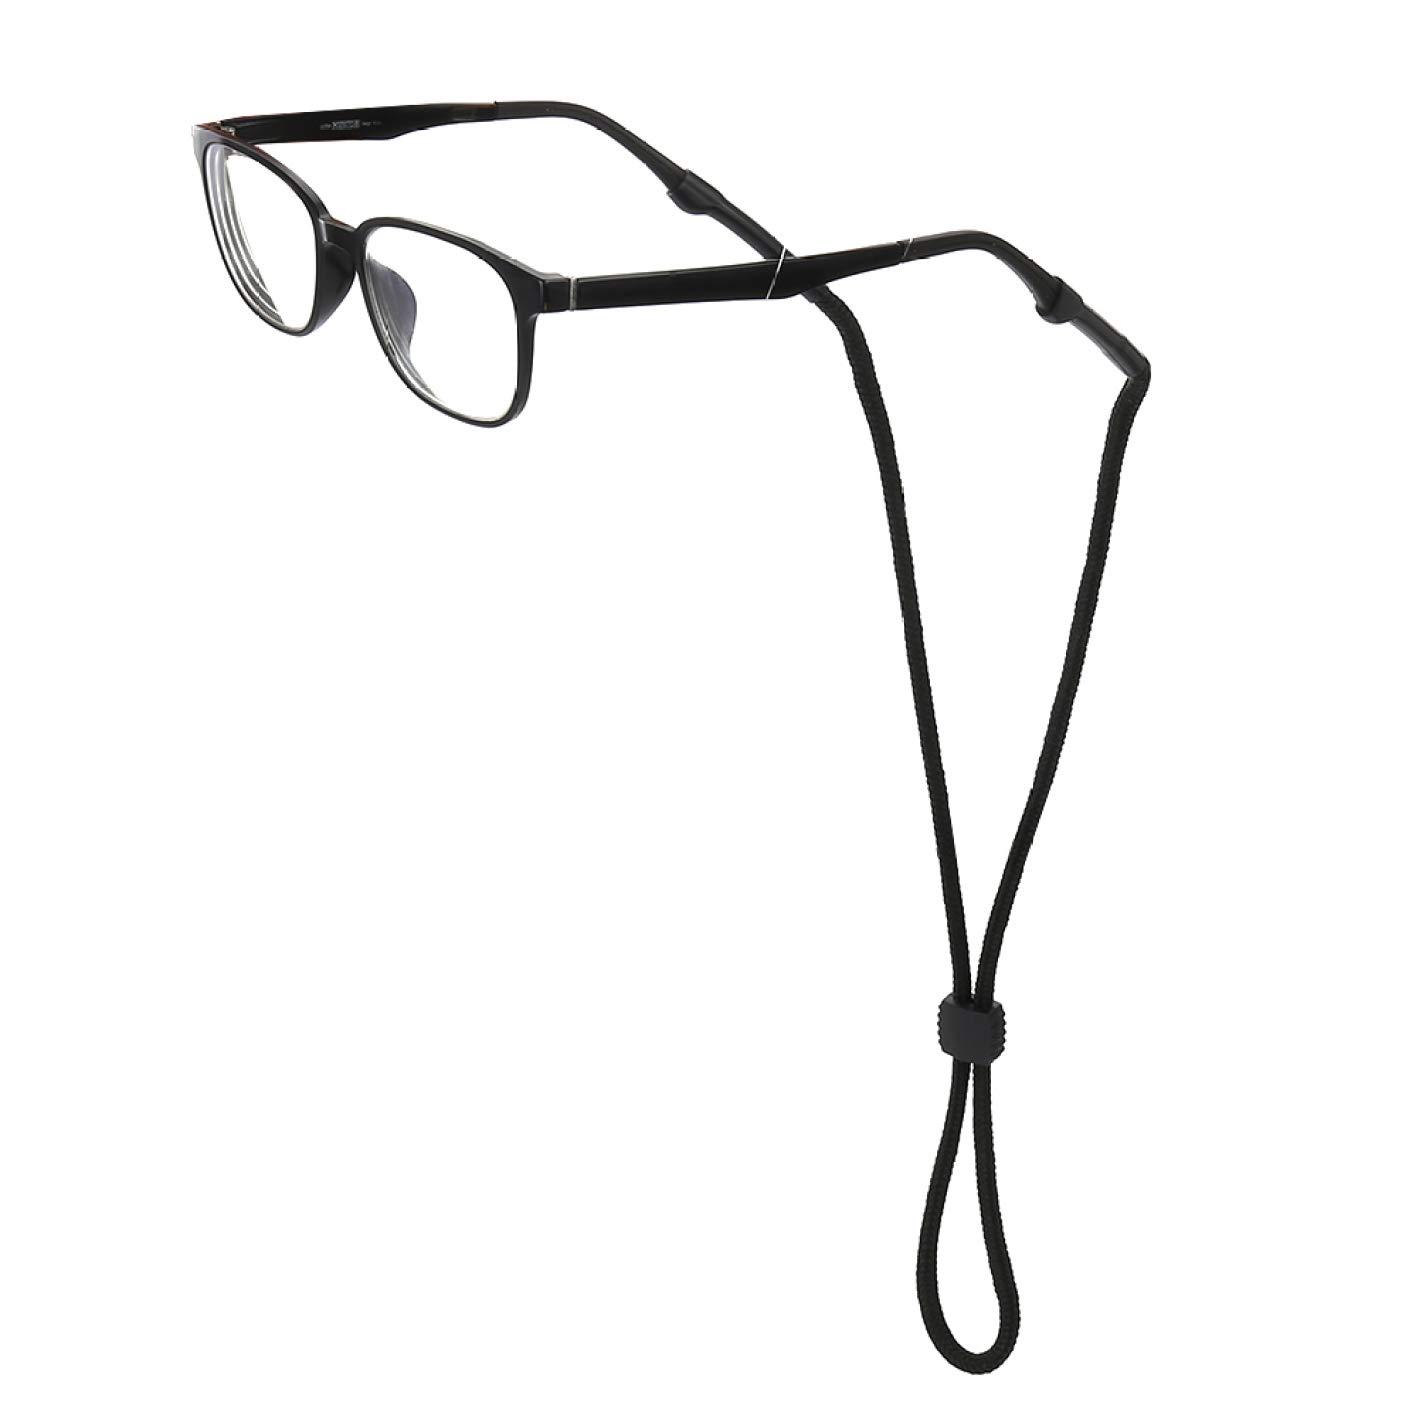 k Zebulon Aled Upgraded Version Eyewear Retainer Sports Sunglass Holder Straps Eyeglasses String